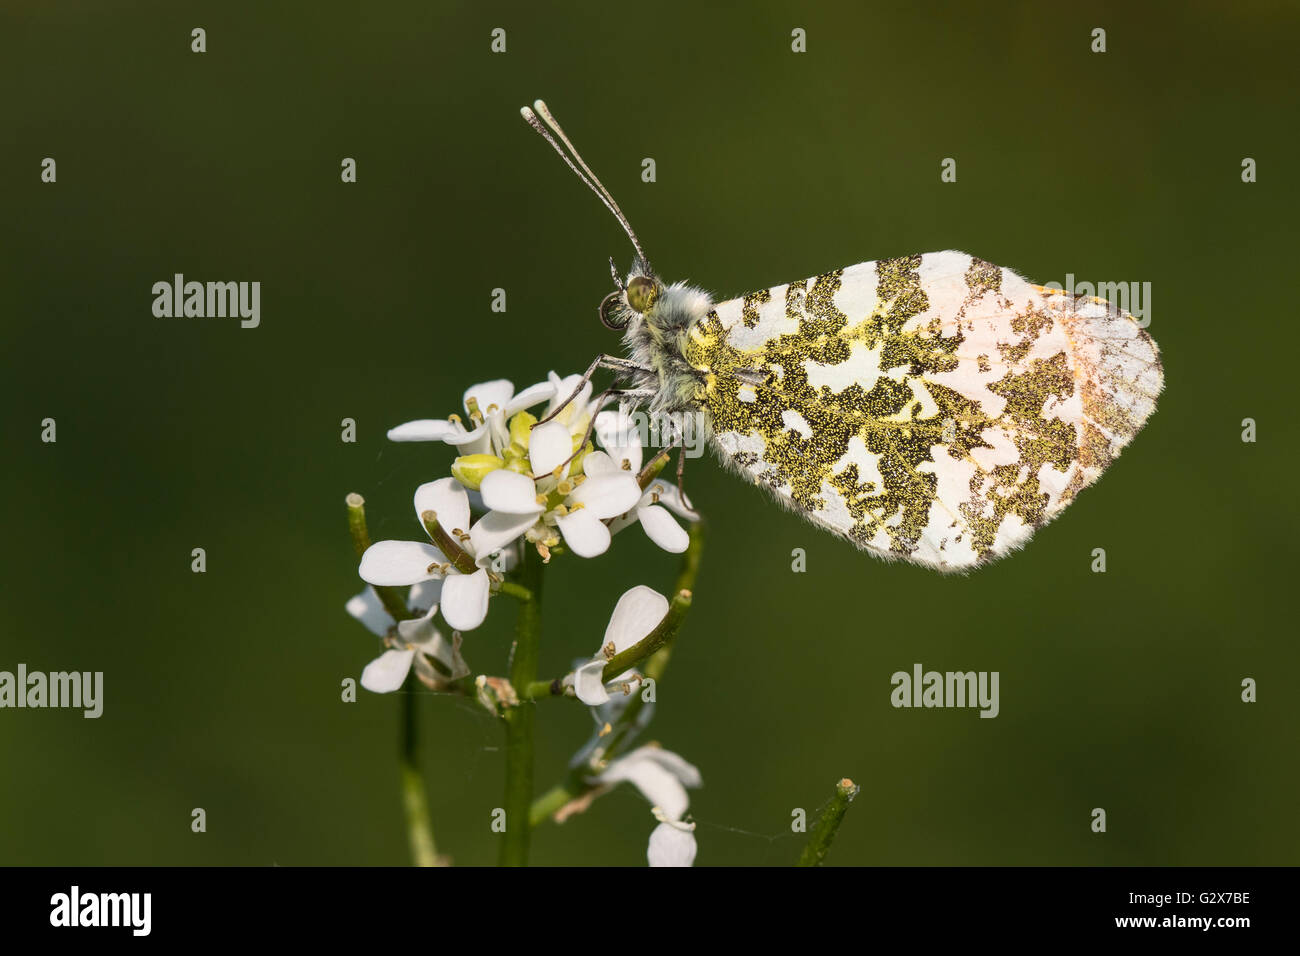 Male Orange Tip butterfly (Anthocharis cardamines) resting on Garlic Mustard (Alliaria petiolata), Cambridgeshire, Stock Photo